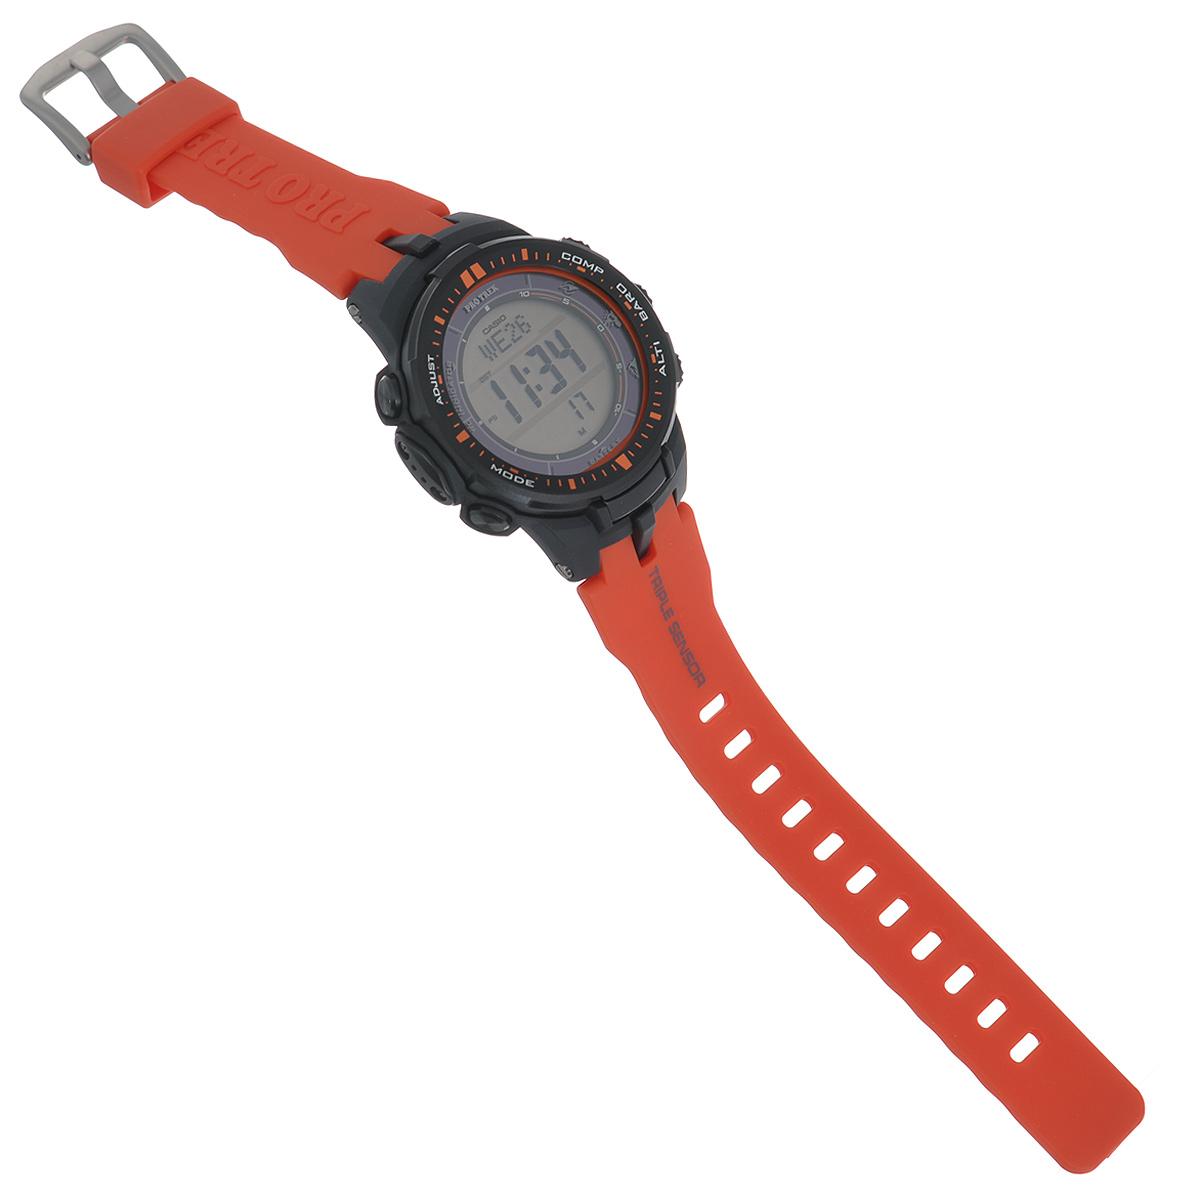 "Часы мужские наручные Casio ""Protrek"", цвет: оранжевый, темно-серый. PRW-3000-4E ( PRW-3000-4E )"